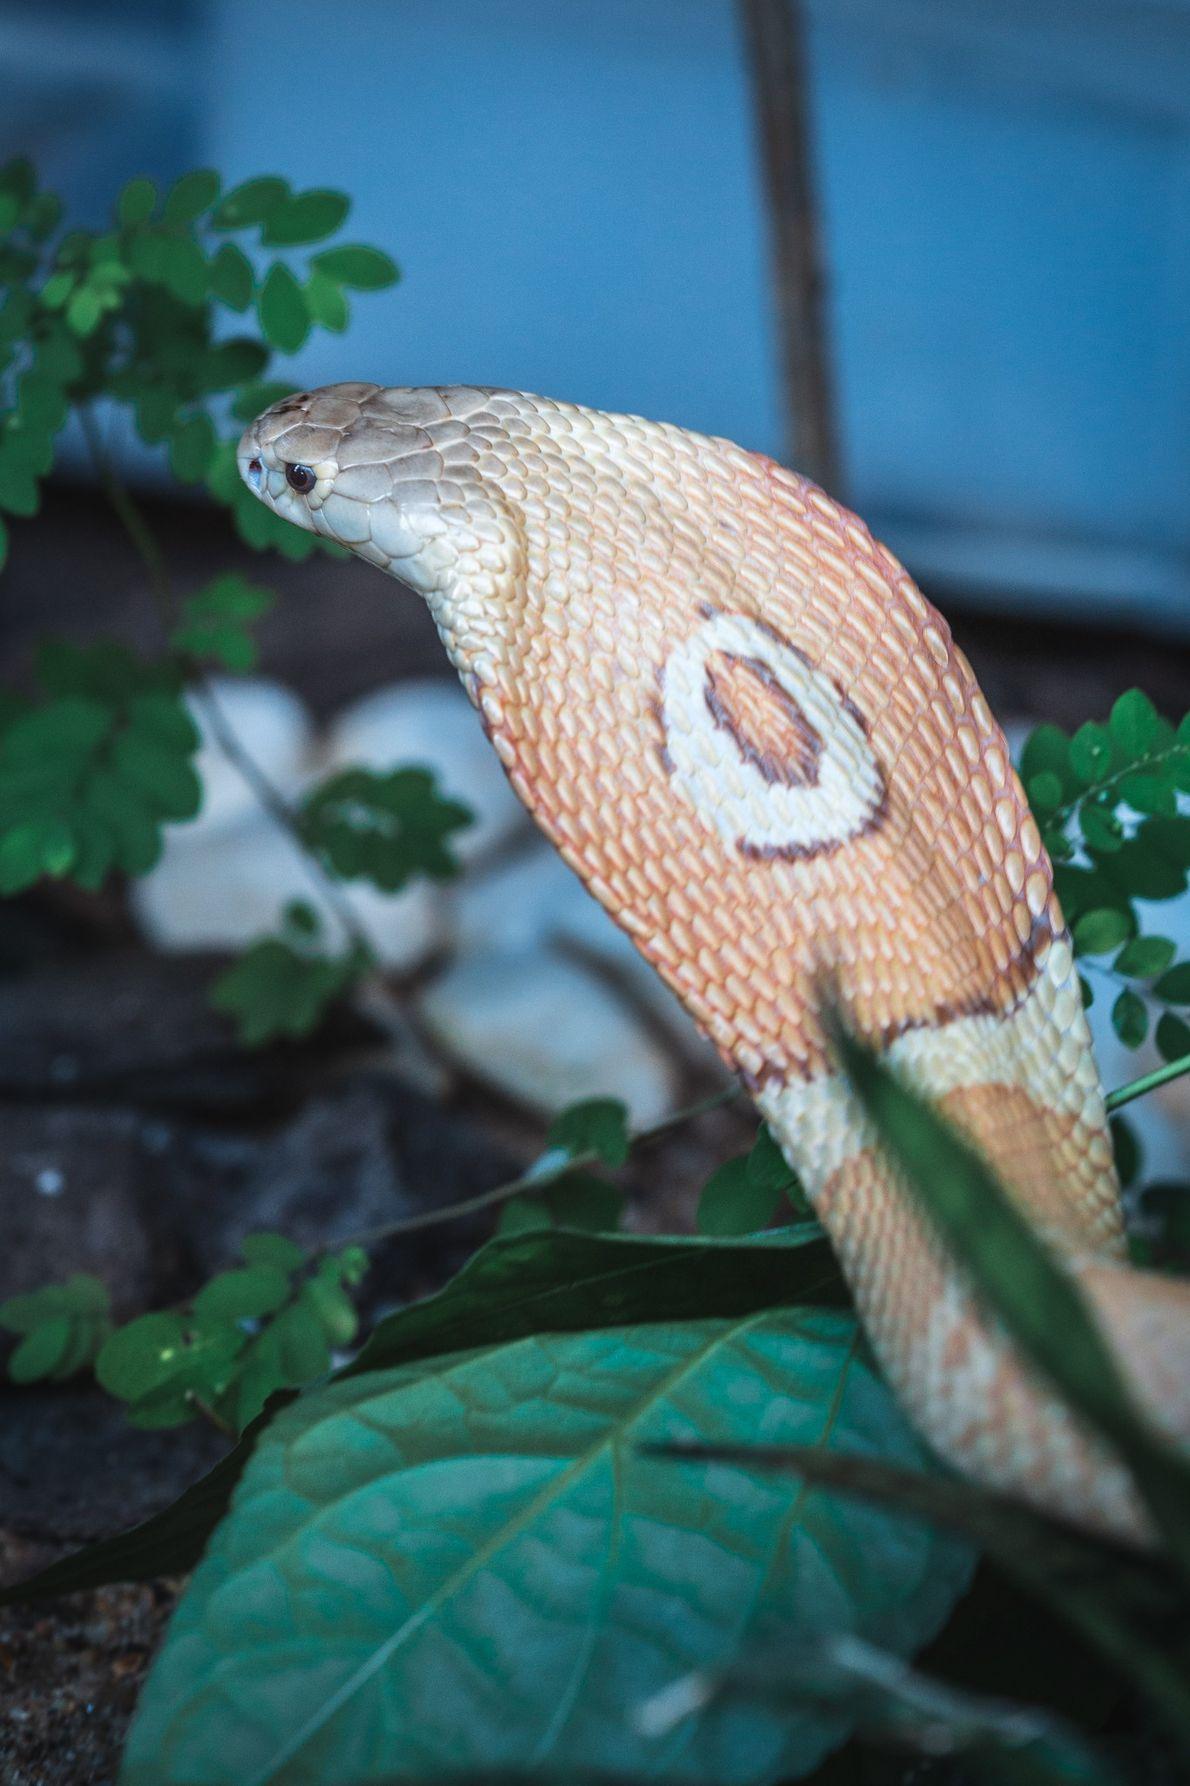 zoo-naja-monoculo-serpente-06